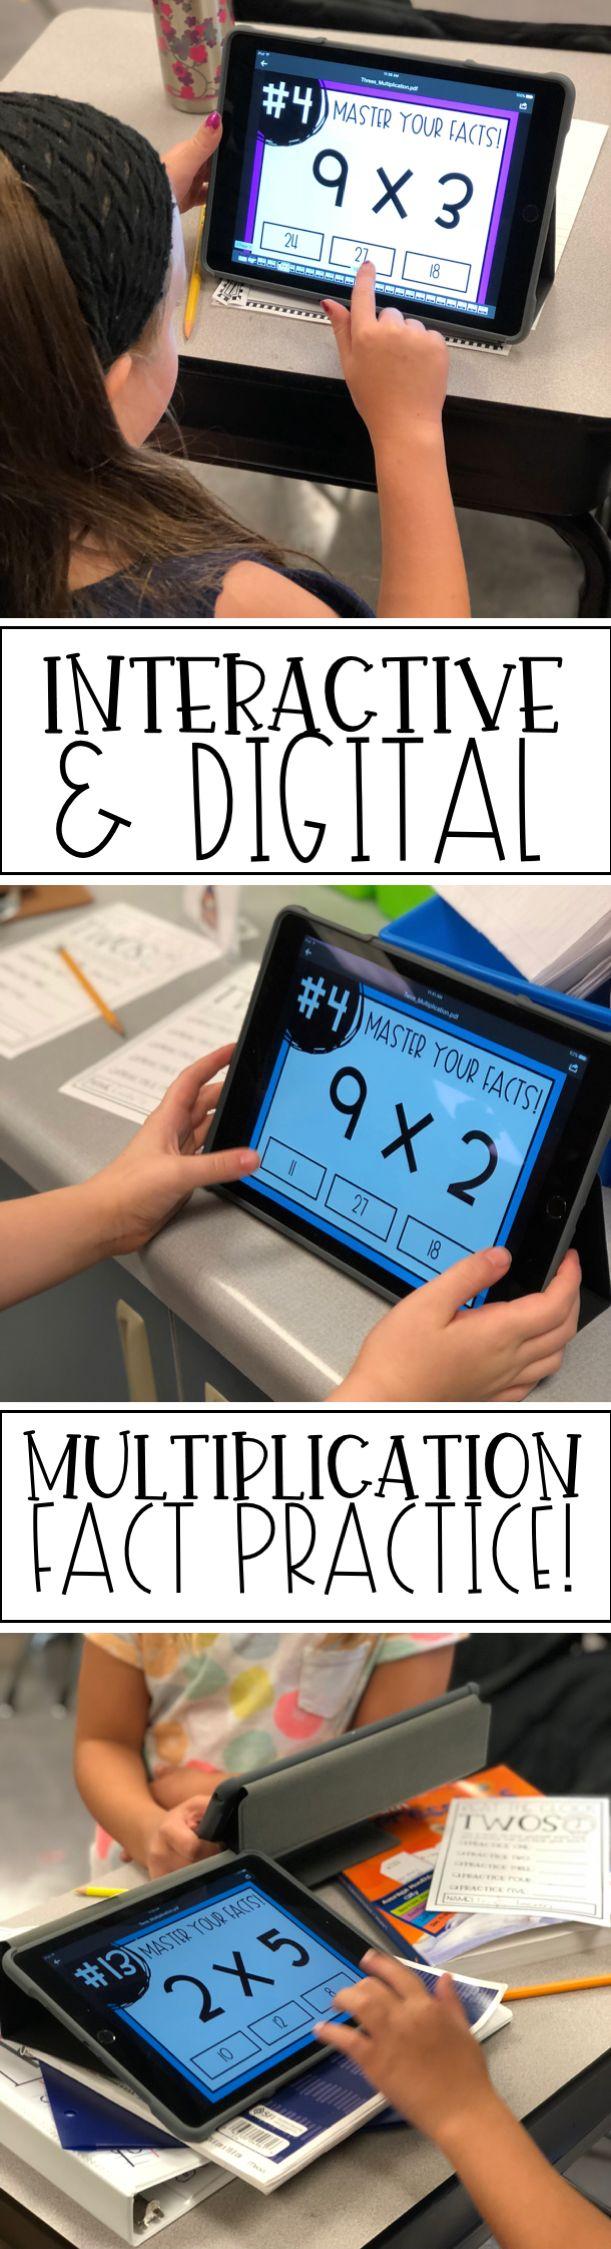 Best 25 multiplication facts practice ideas on pinterest master your multiplication facts interactive pdf activities growing bundle gamestrikefo Gallery